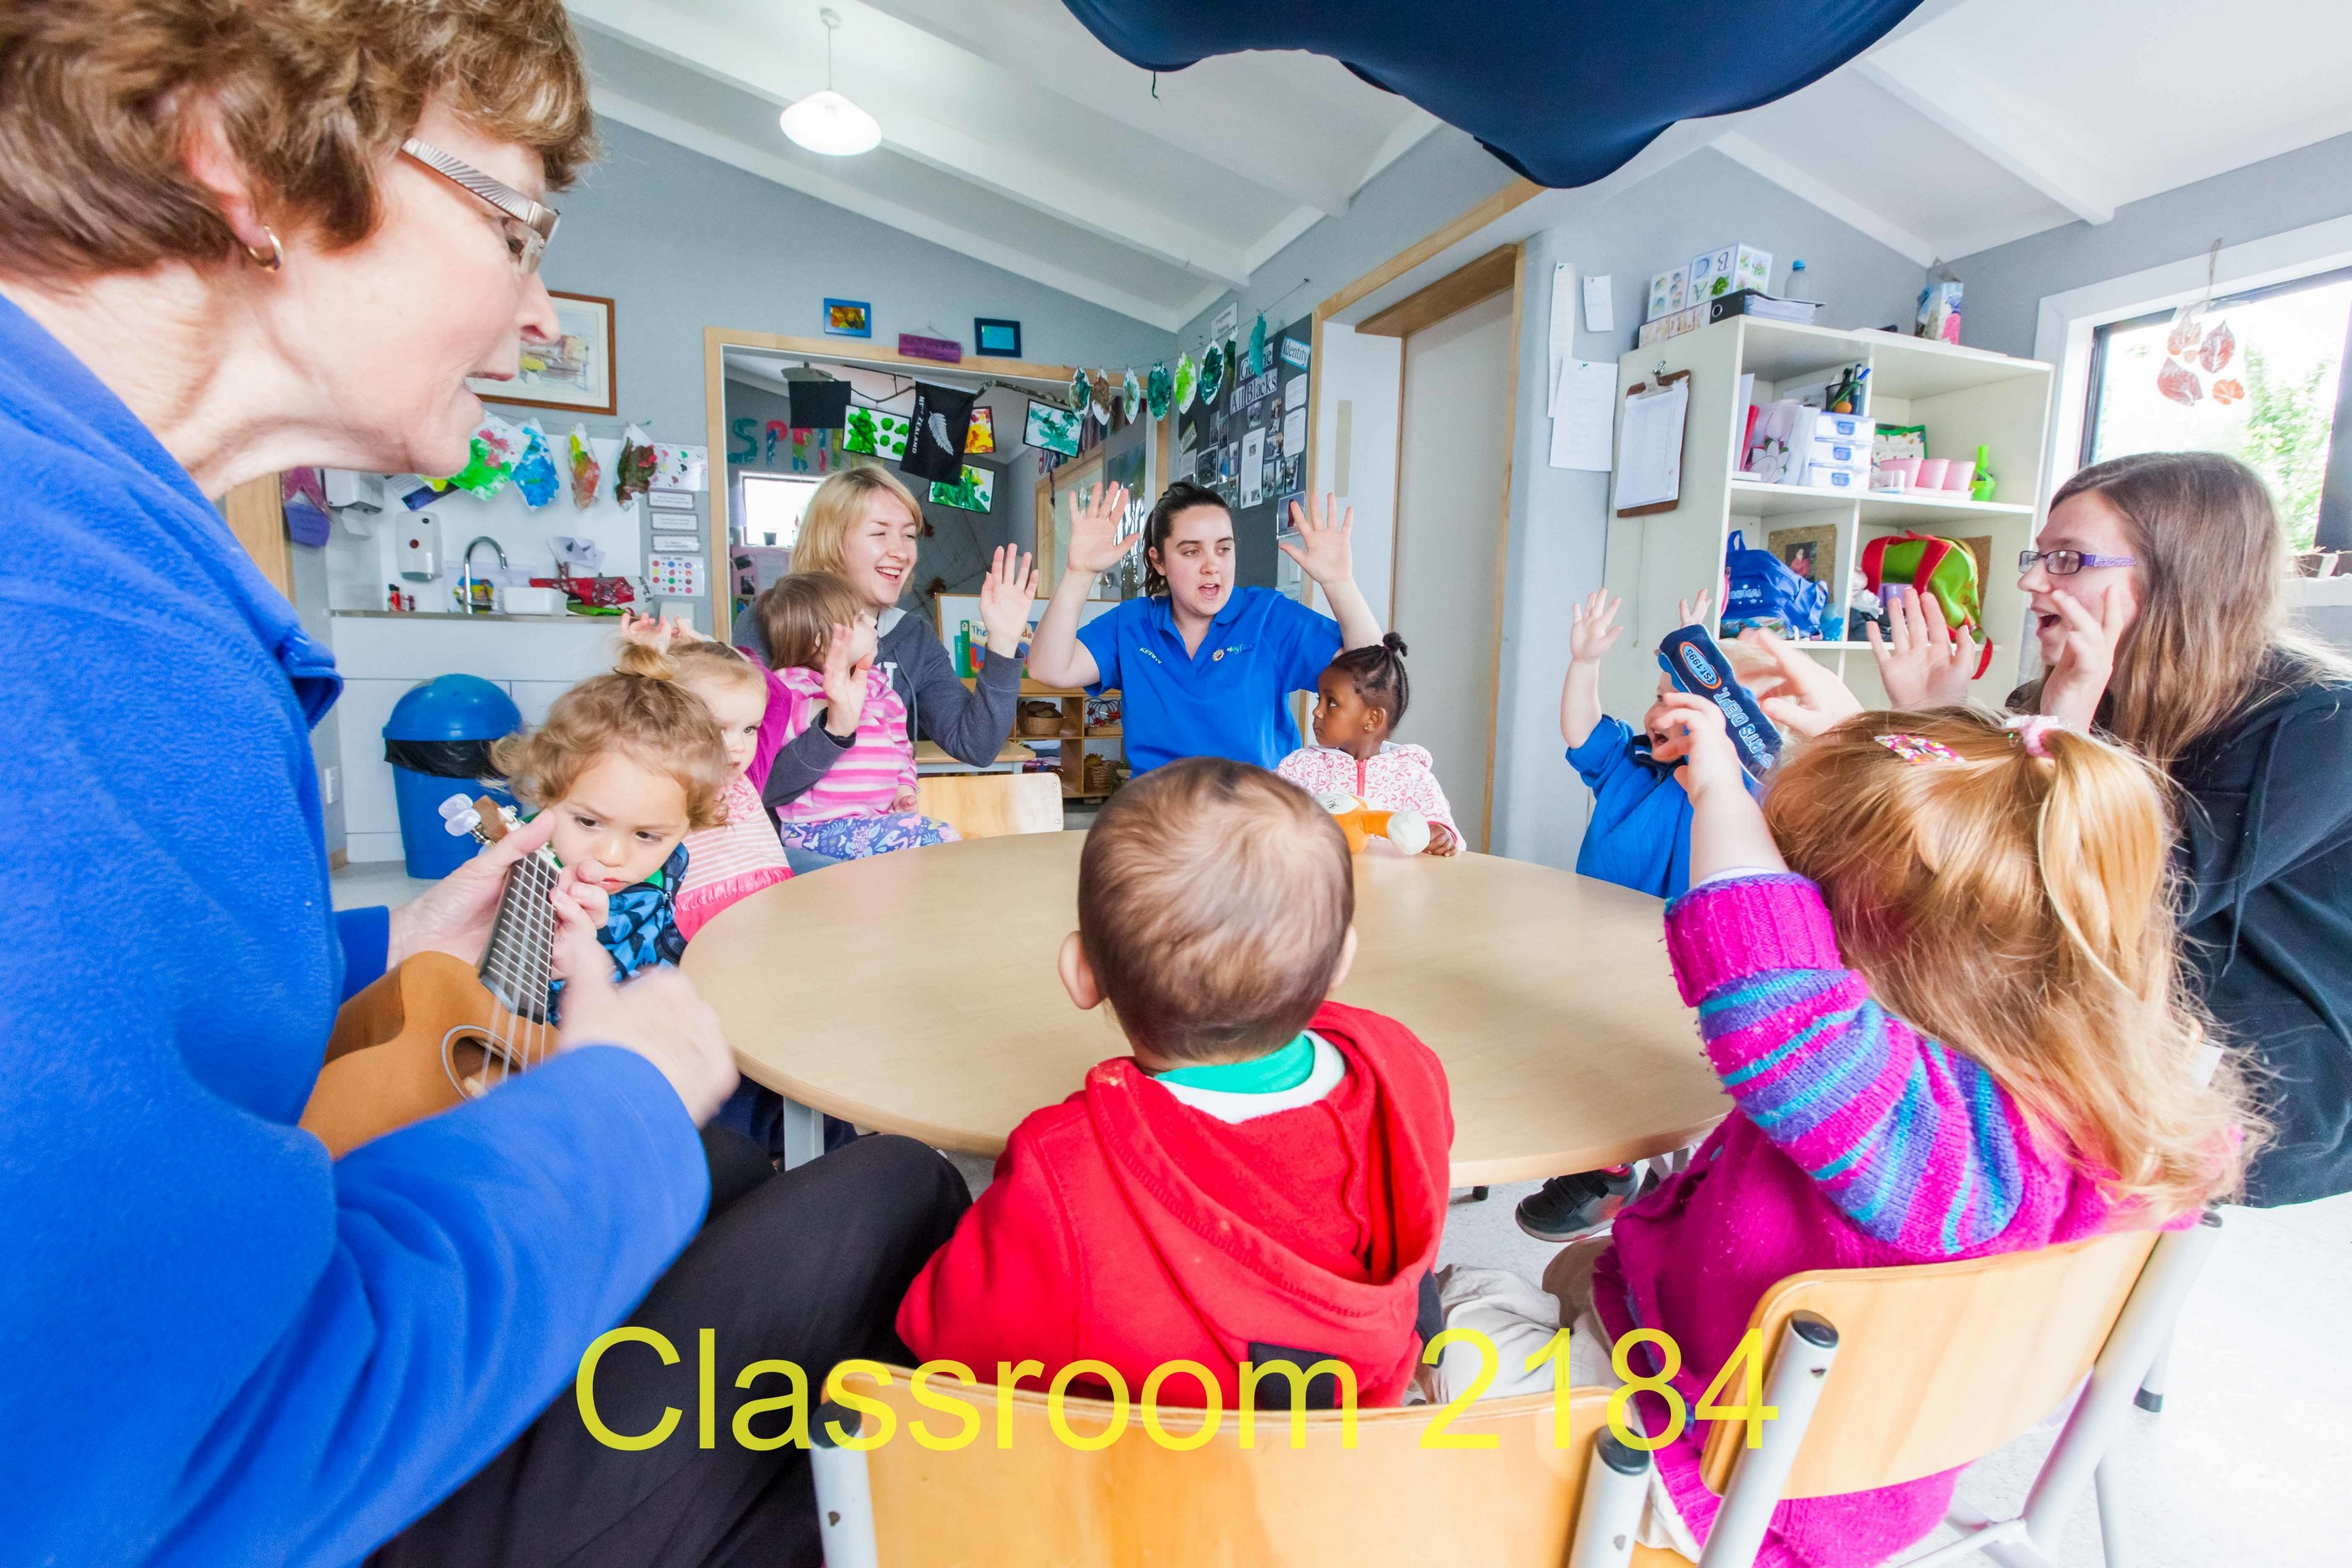 Classroom 2184